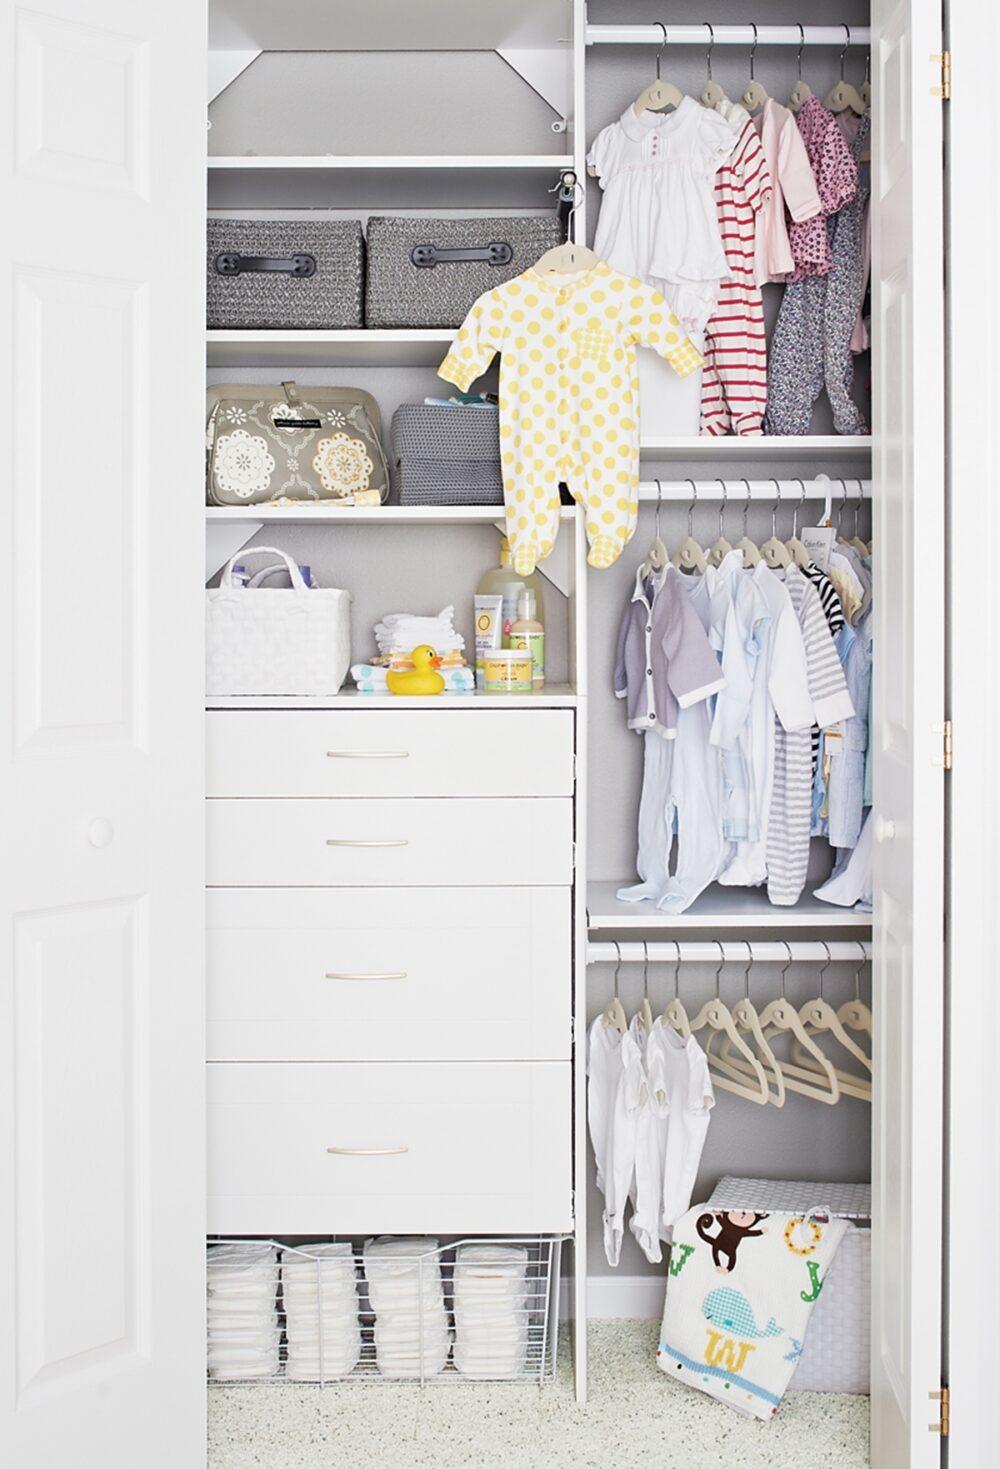 A neatly organized closet in a baby's nursery.